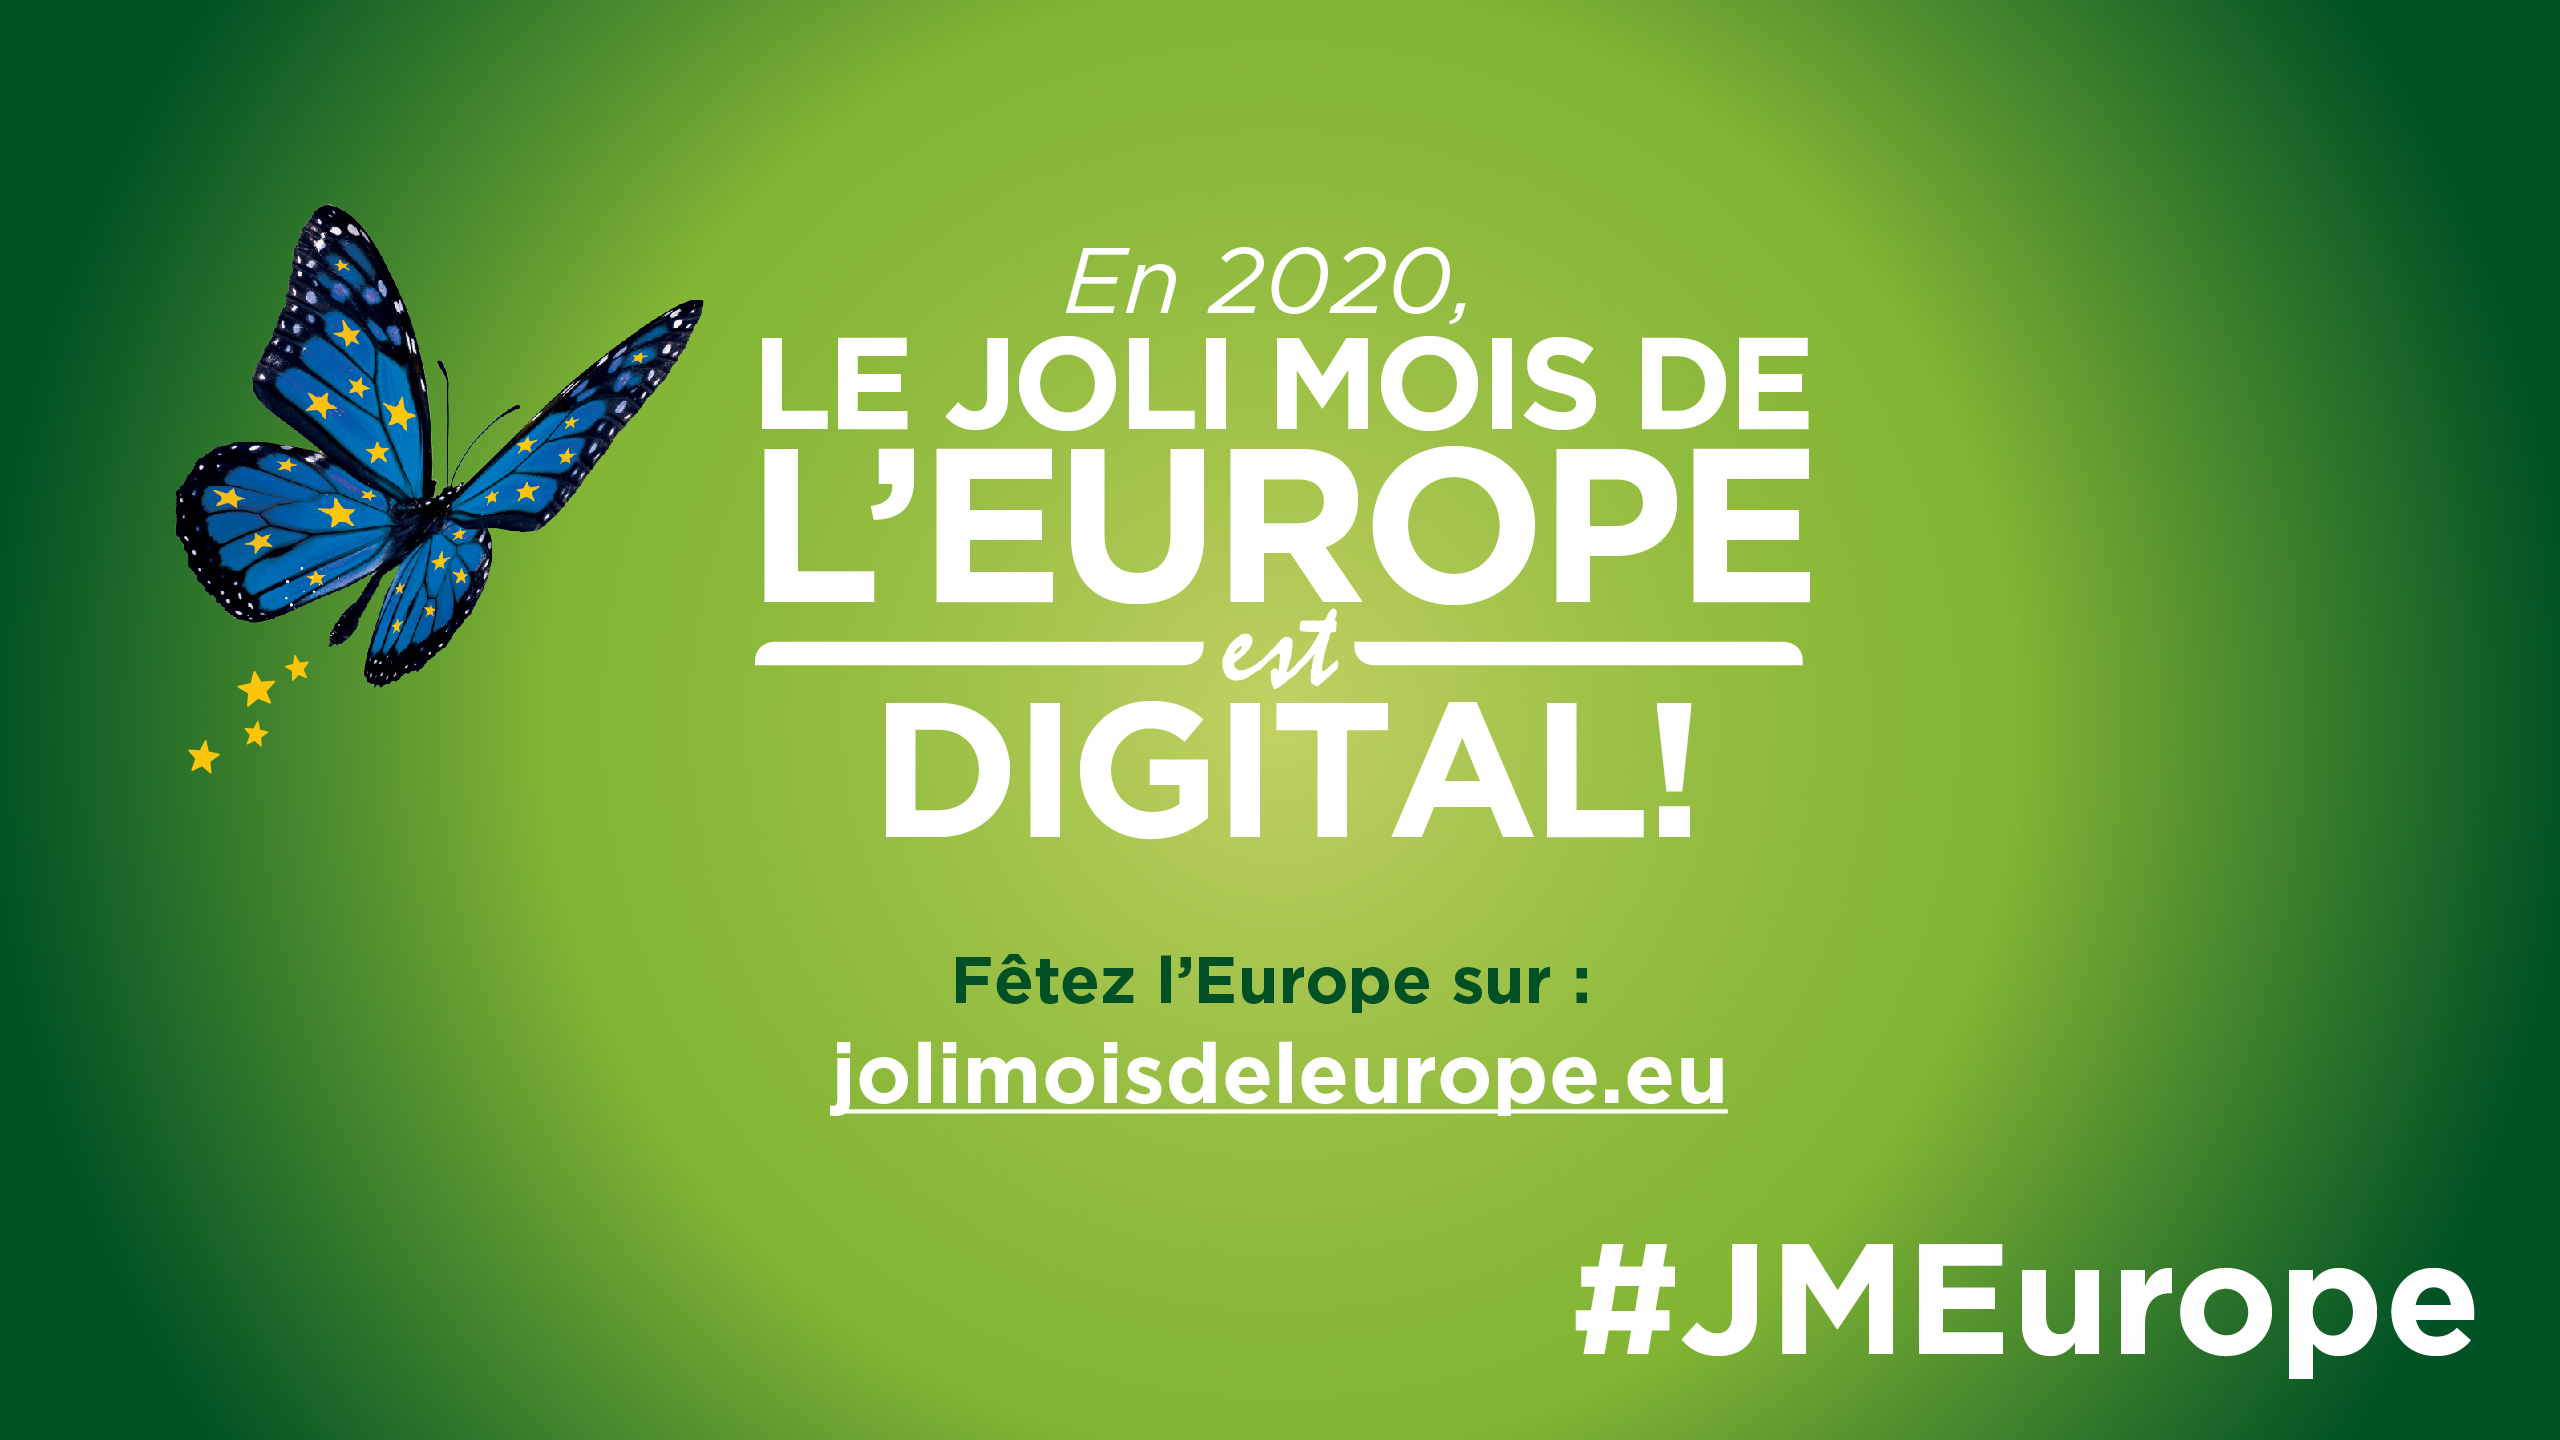 Europe, joli mois, régions, France, digital, 2020